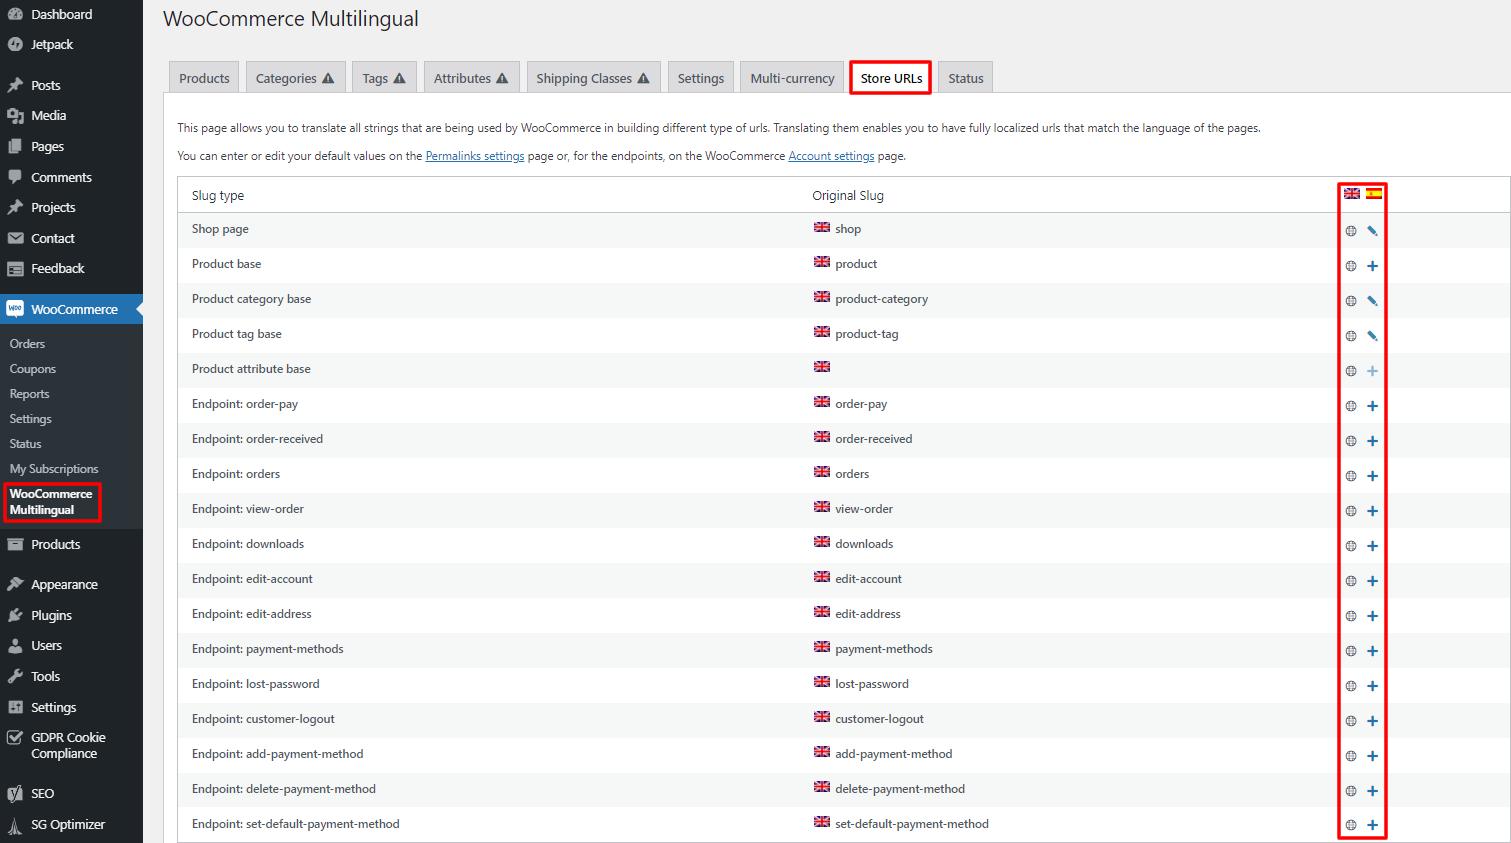 WooCommerce multilingual URL translation